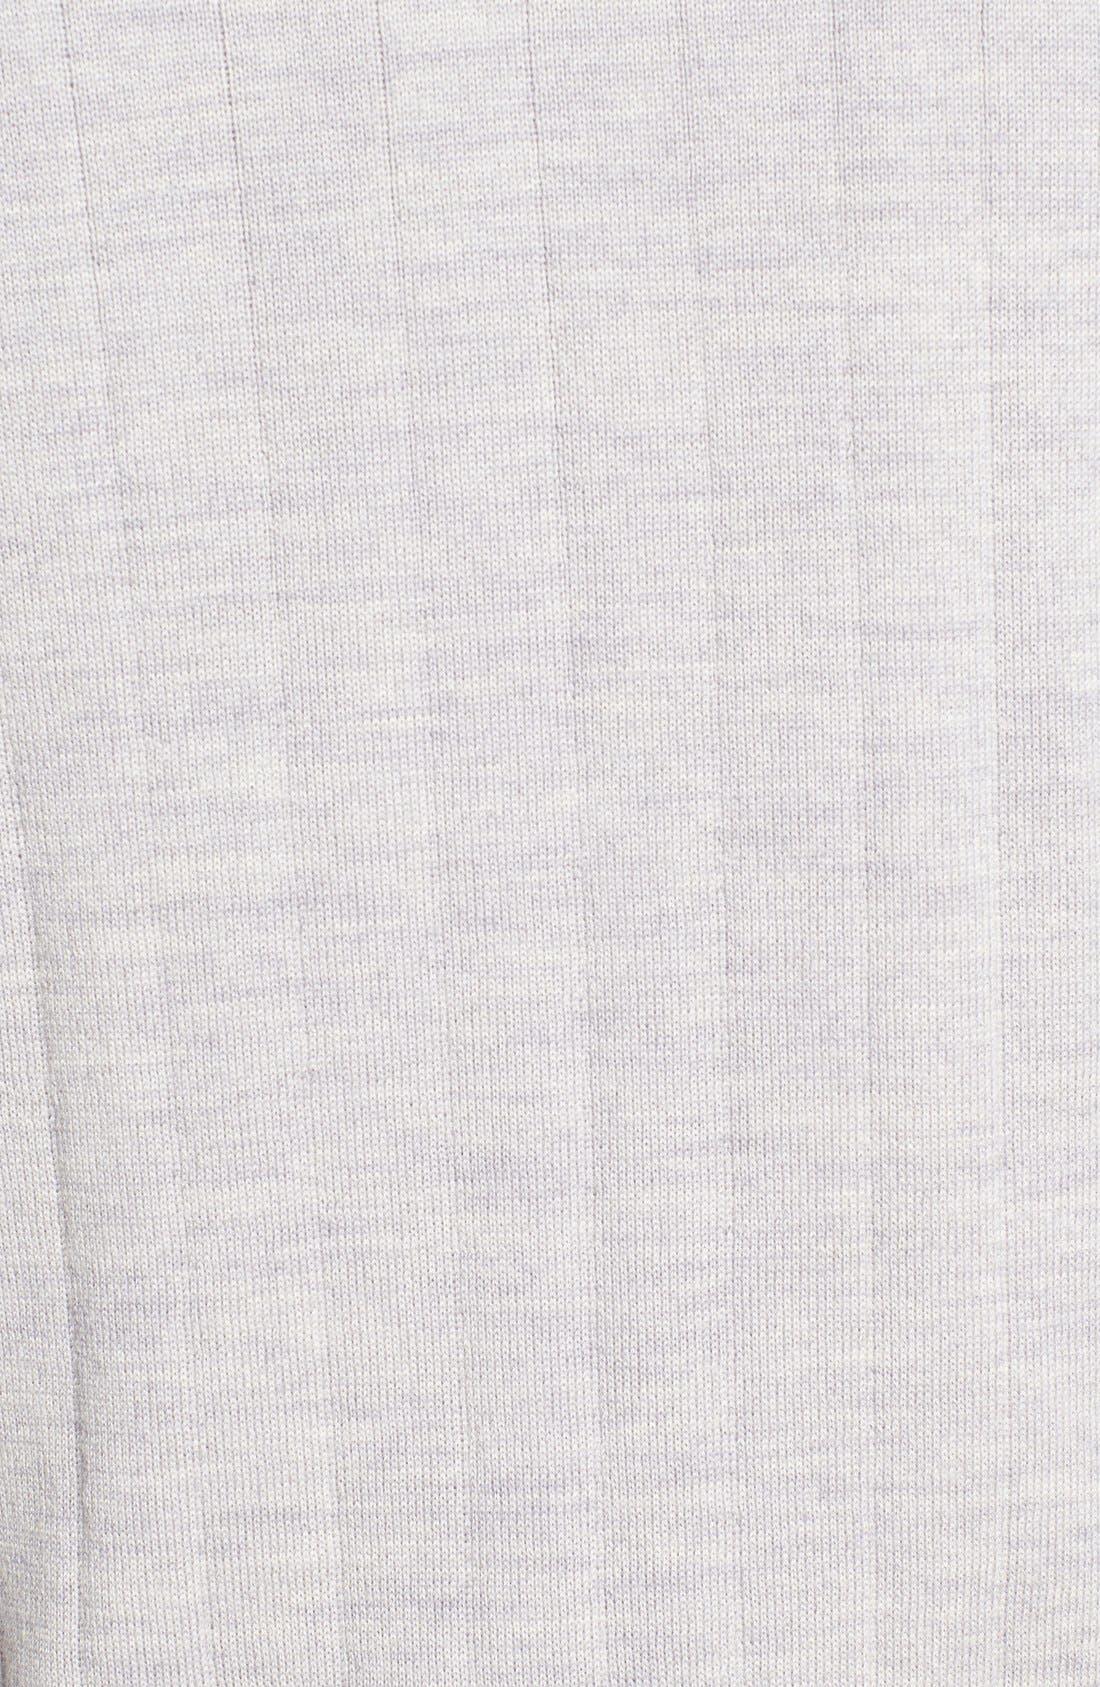 Windproof Merino Wool Quarter Zip Sweater,                             Alternate thumbnail 5, color,                             HEATHER GREY